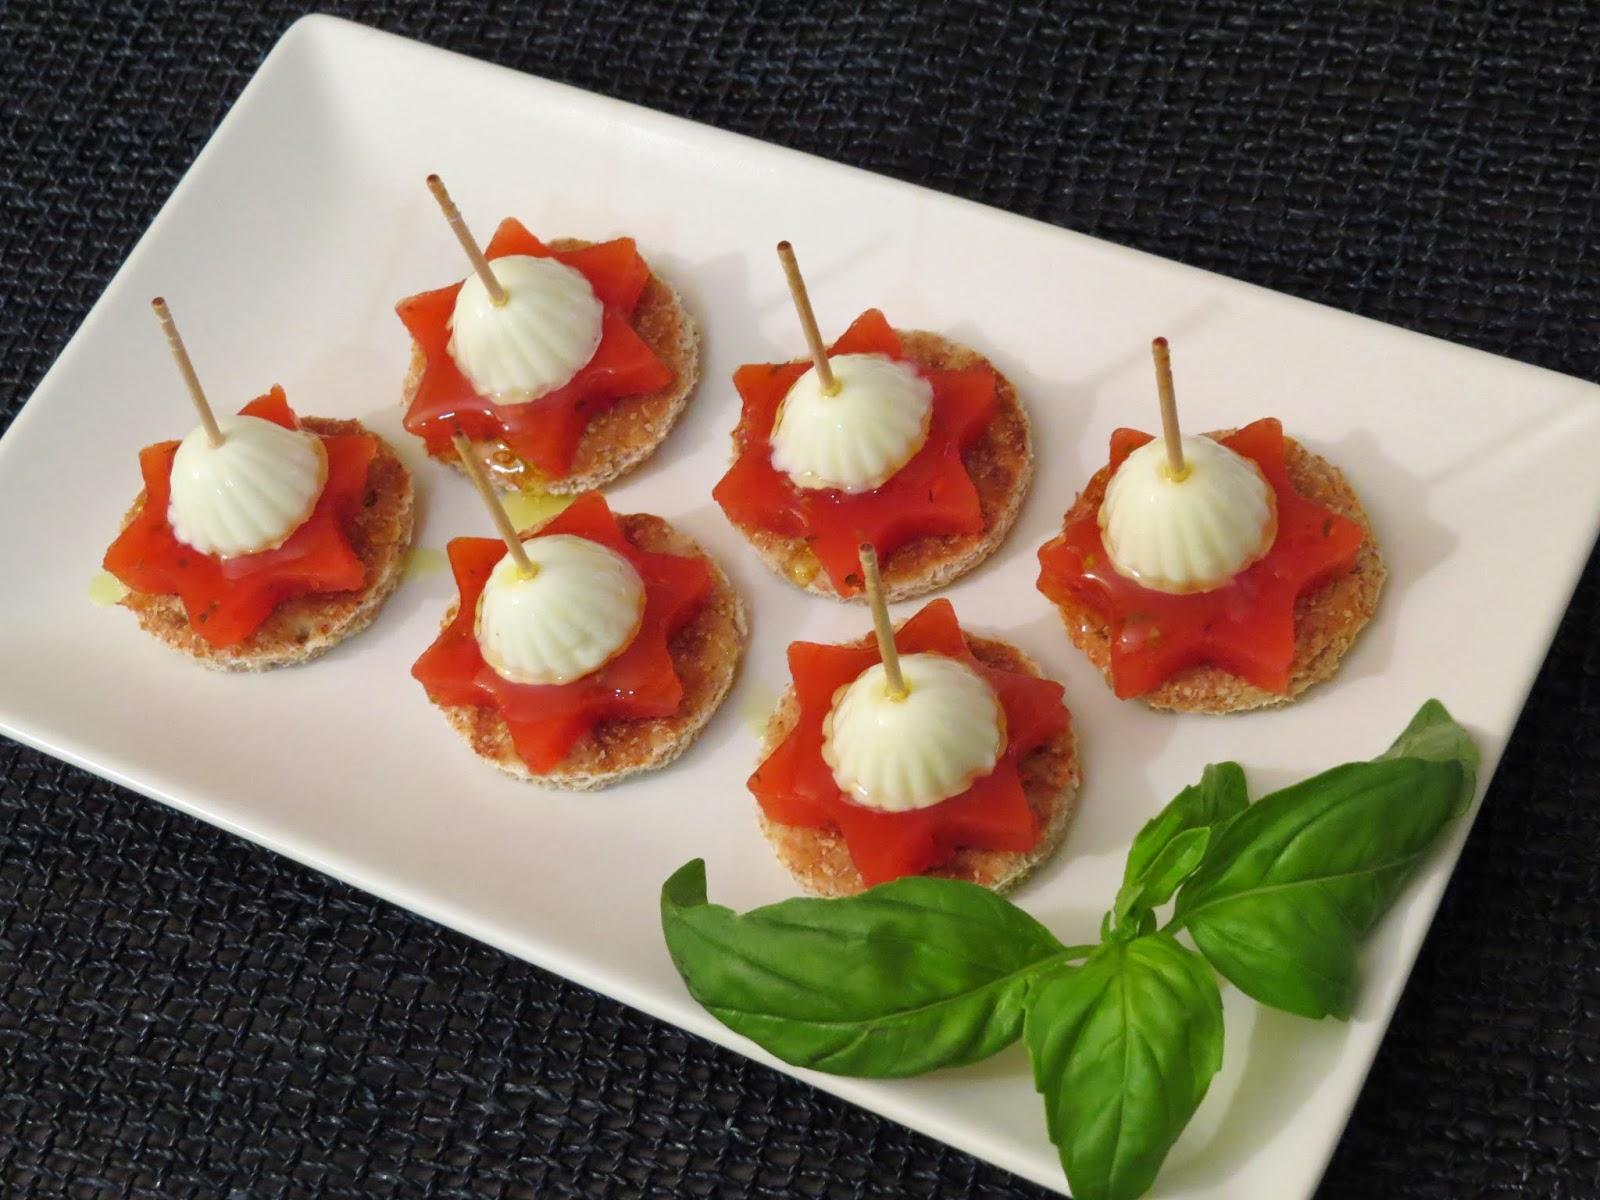 Gelatina de tomate ¡Atrévete a probarla!